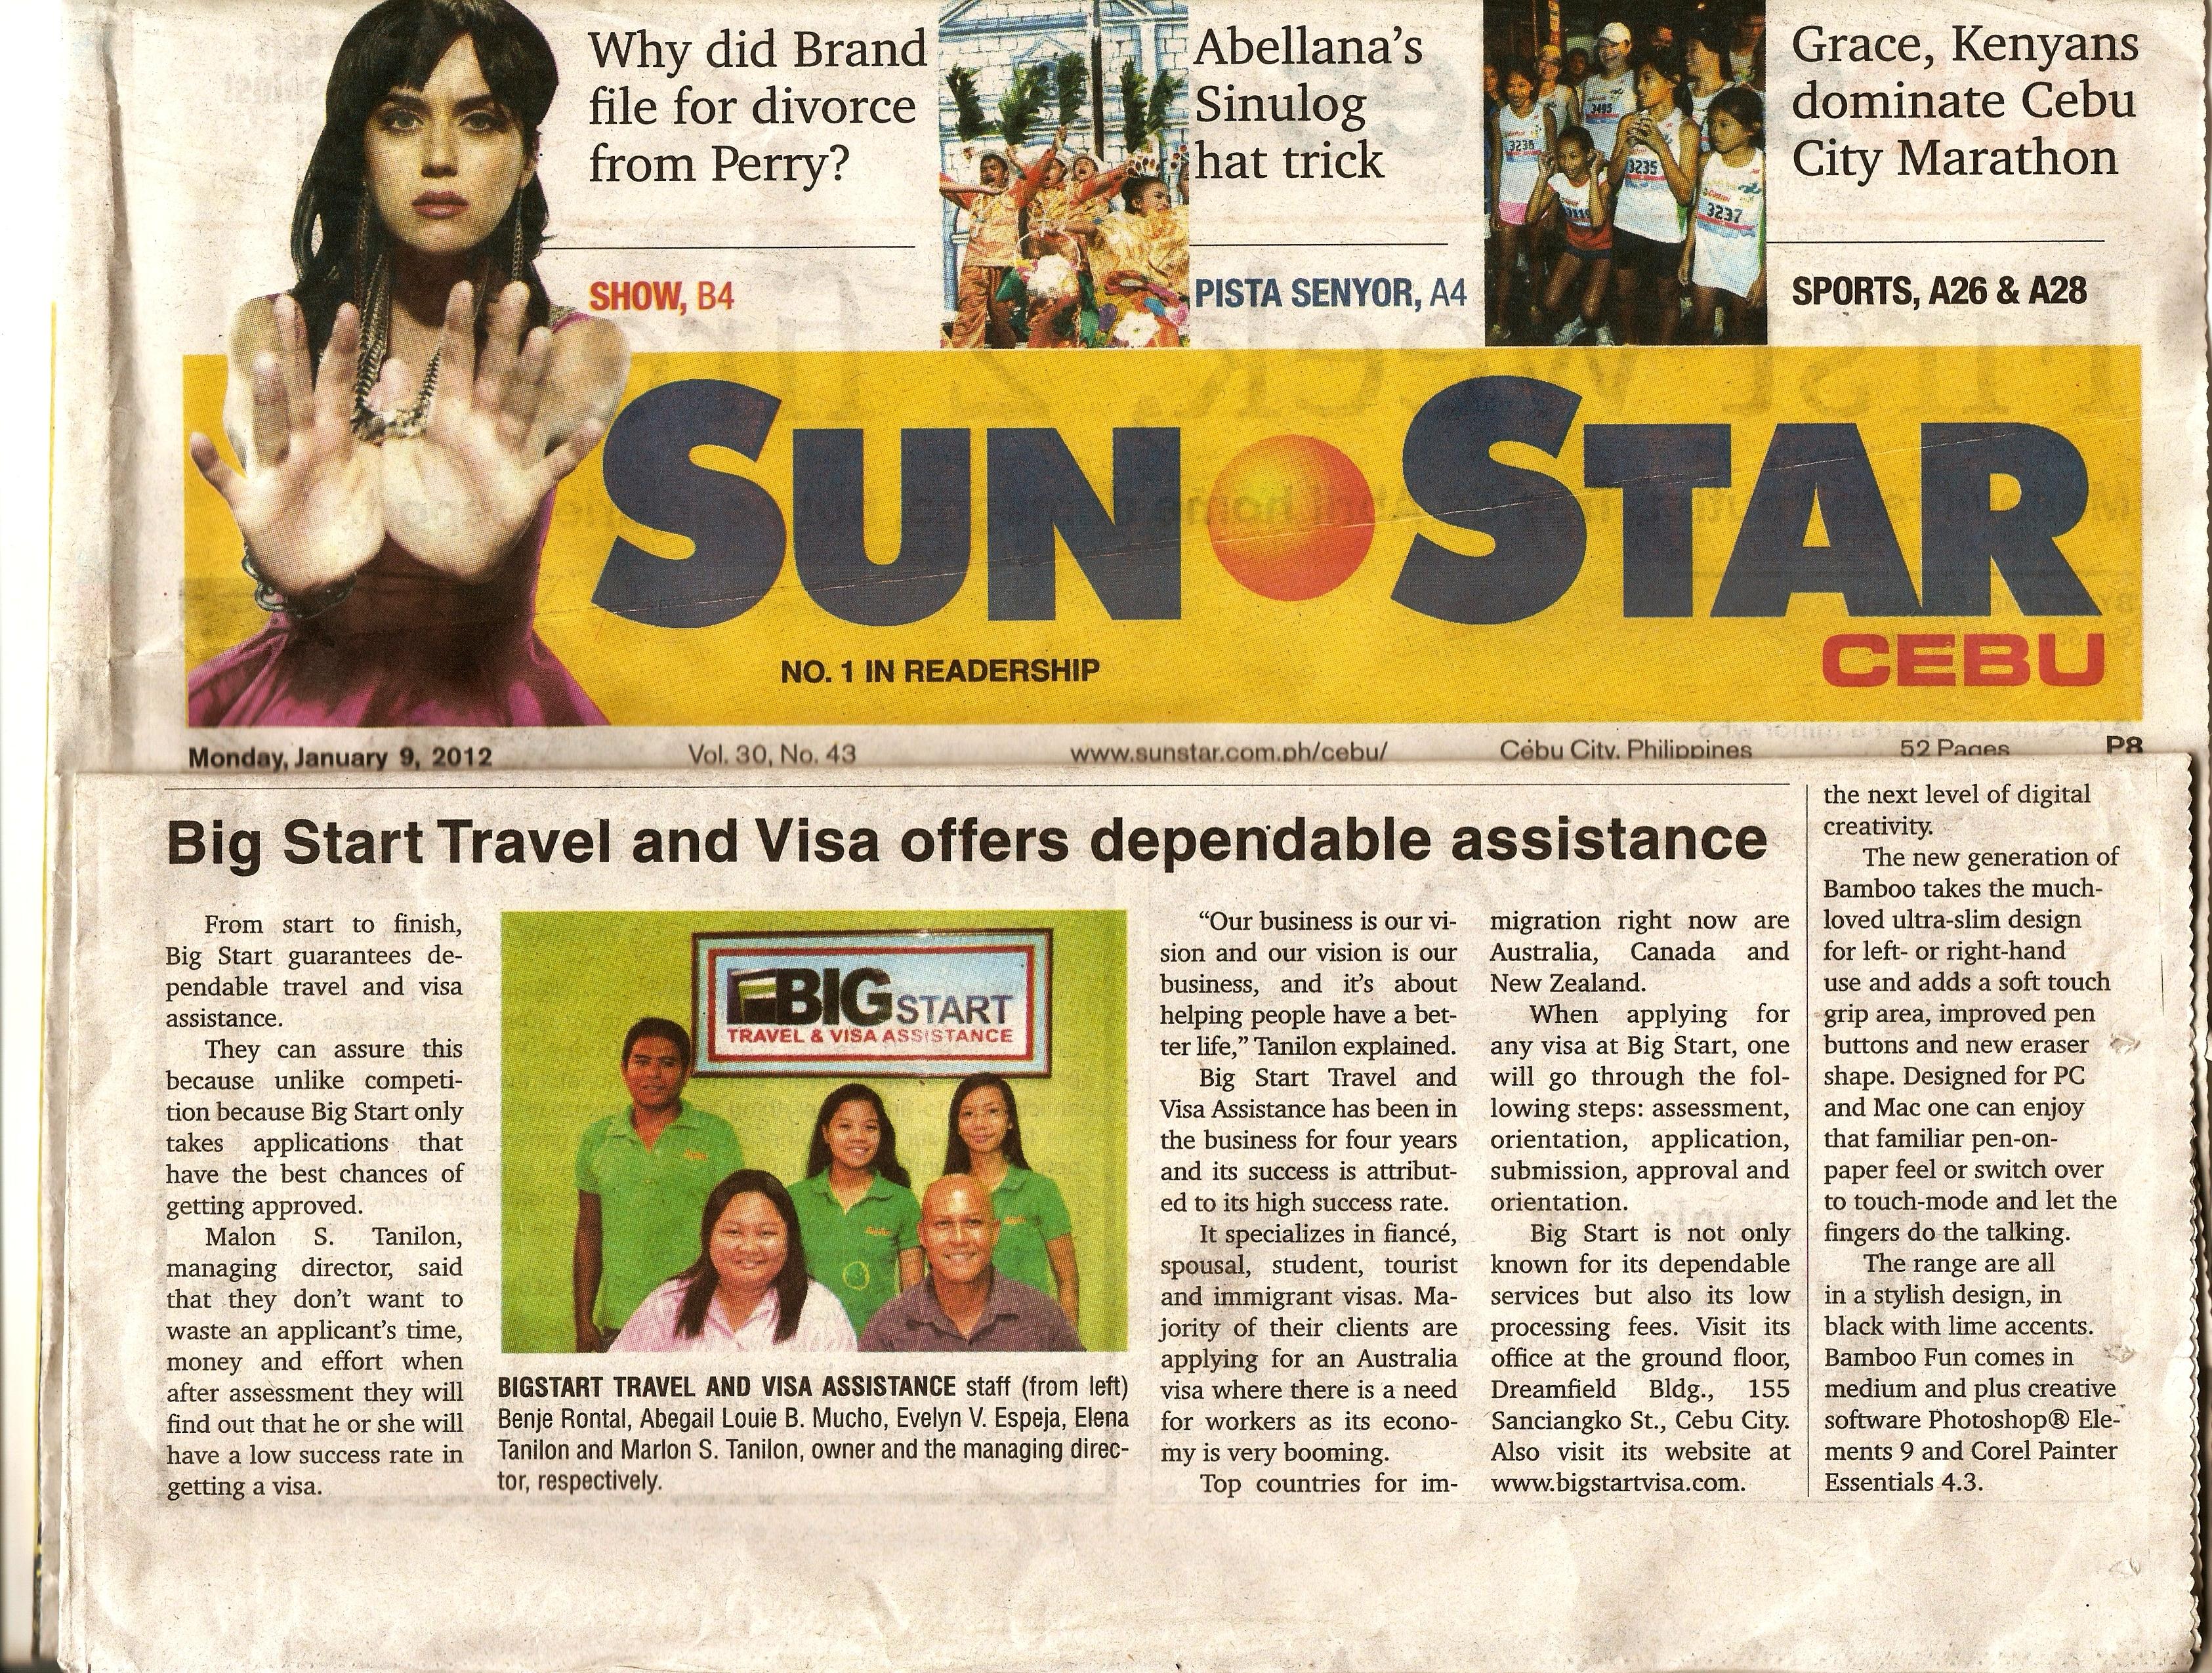 Bigstart Travel and Visa Assistance Staff